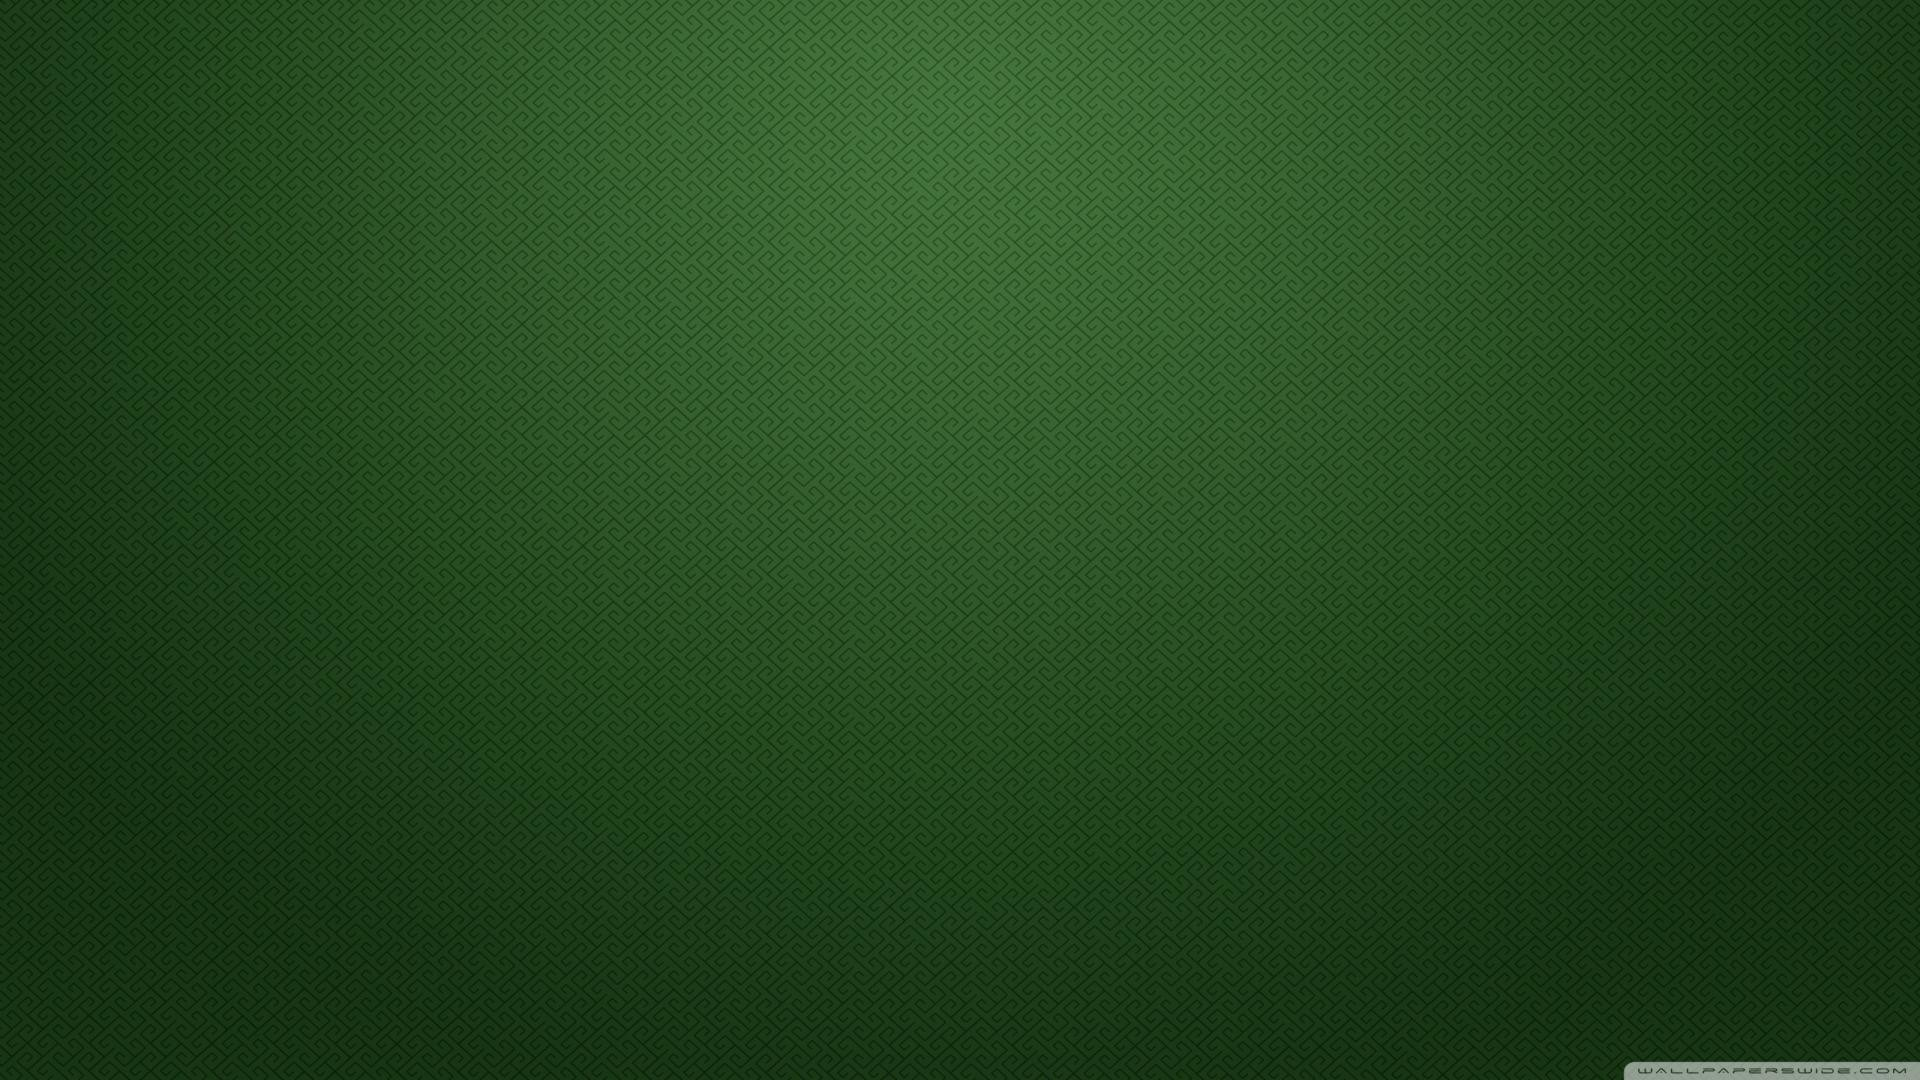 Dark Green HD Wallpaper